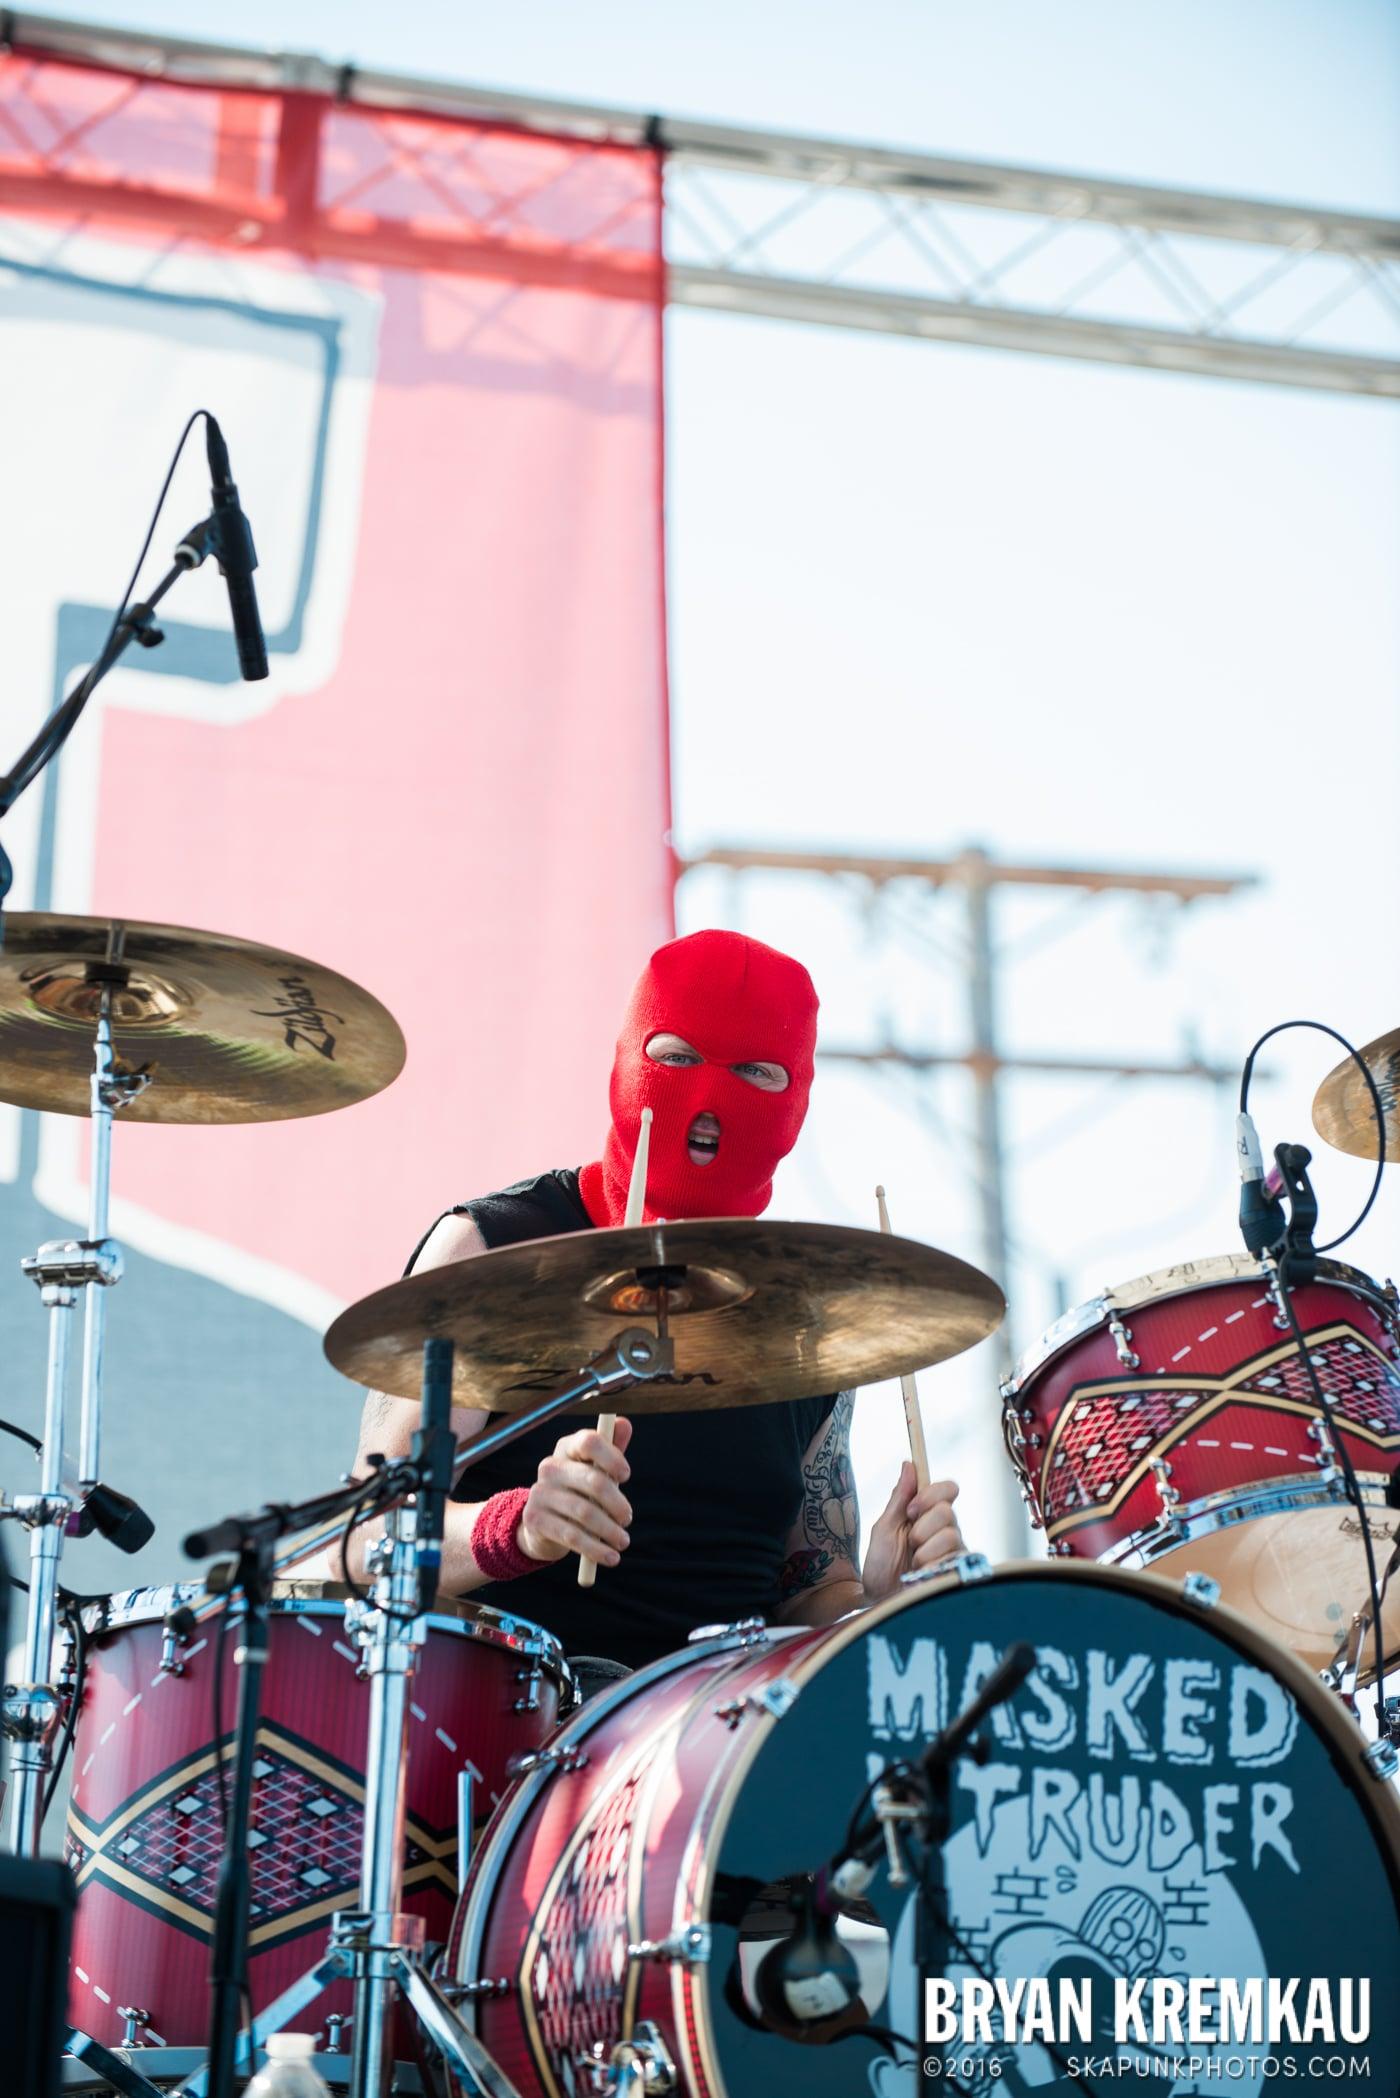 Masked Intruder @ Stone Pony Summer Stage, Asbury Park, NJ - 8.15.15 (16)